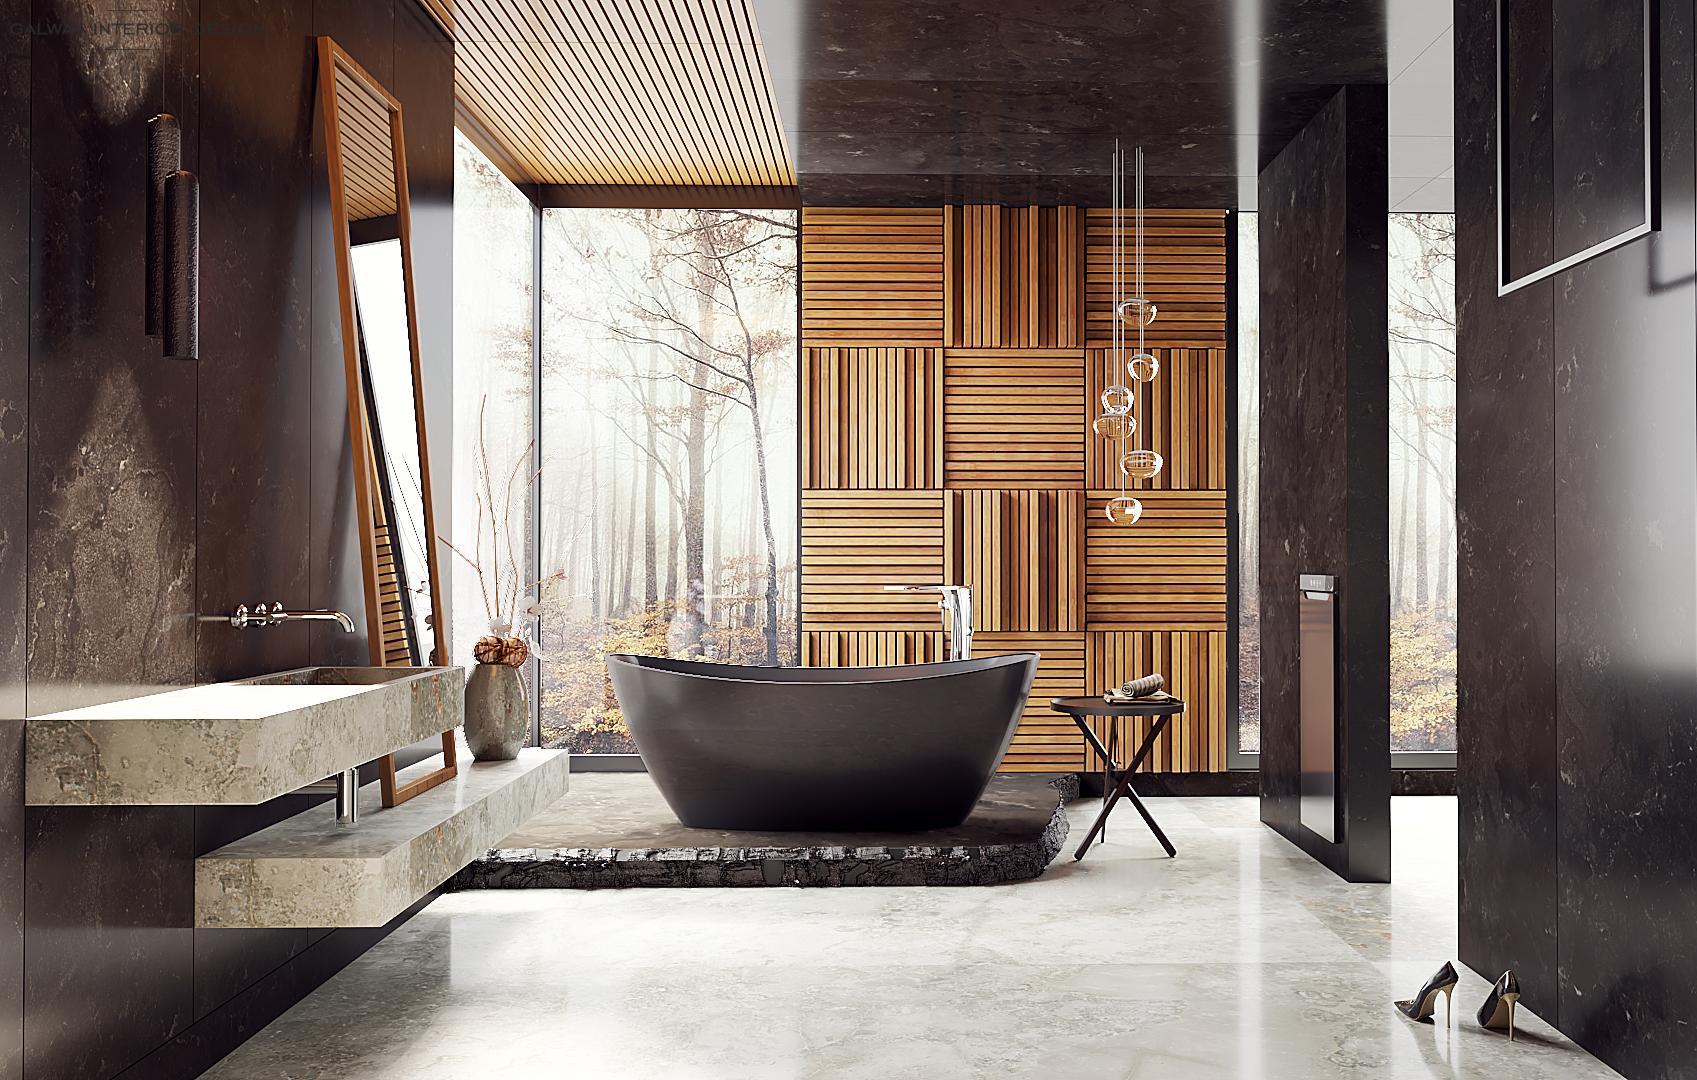 Galway Interior Design Big Stylish Bathroom